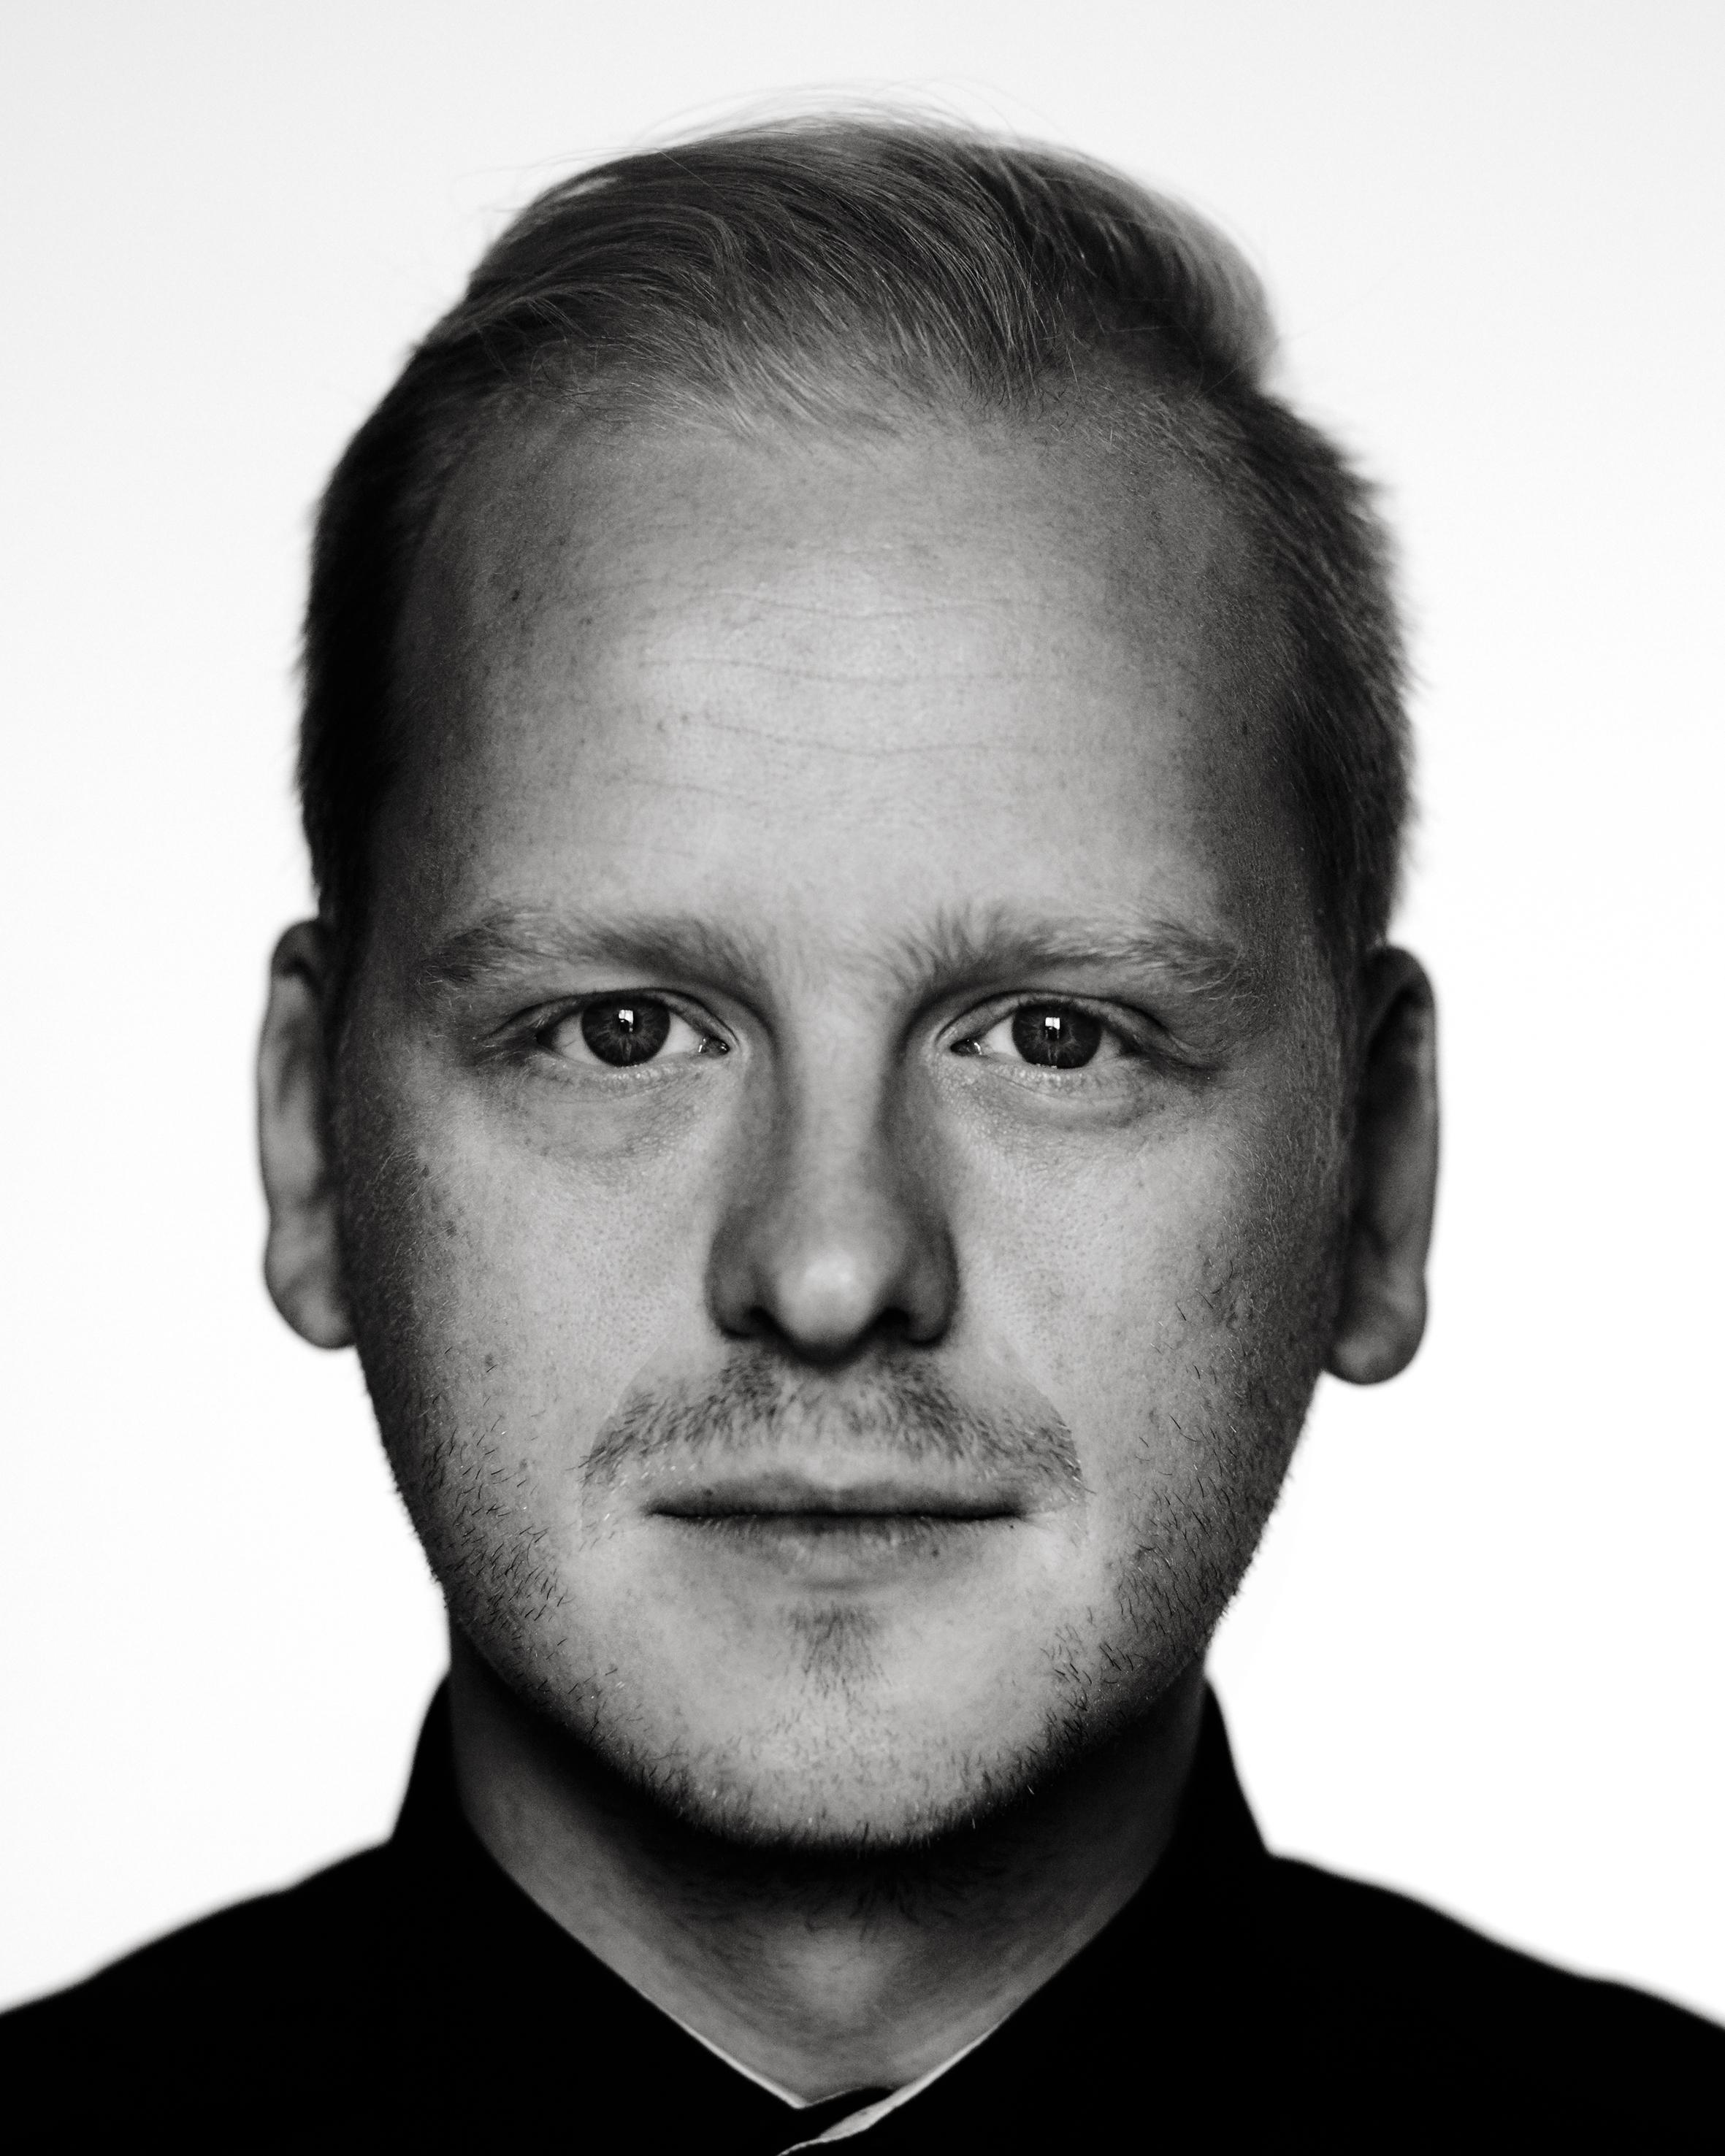 Ævar Þór Benediktsson